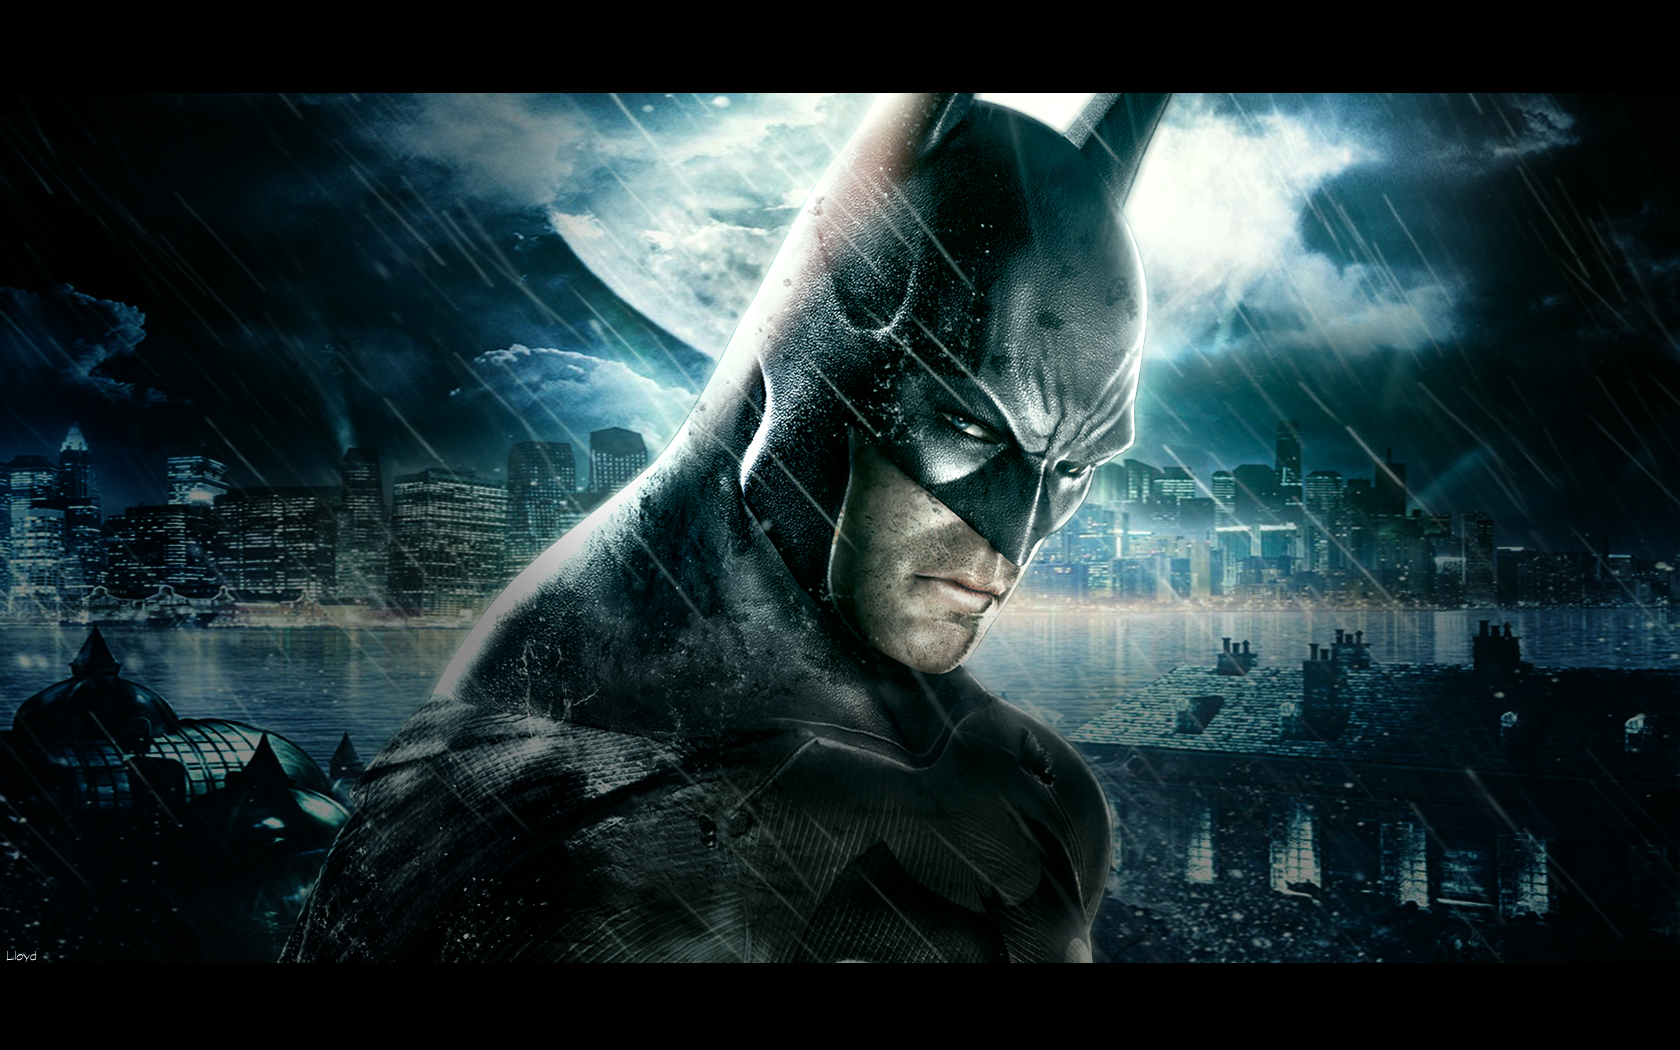 BatmanArkham Asylum Wallpaper by igotgame1075 1680x1050